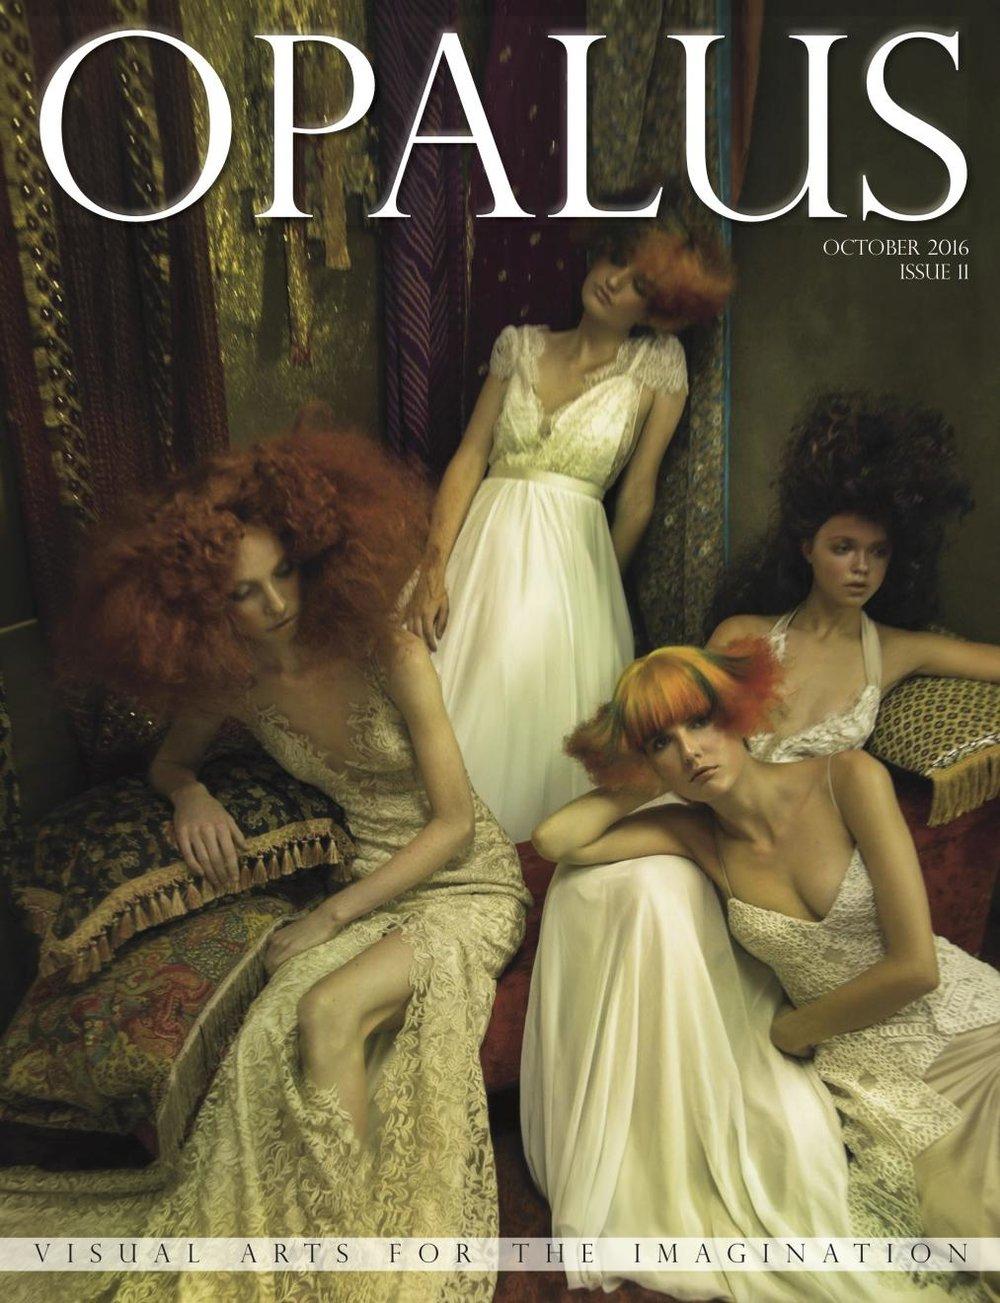 OPALUS_MAGAZINE_OPALUS_Magazine_Issue_11_1070x1320.jpg